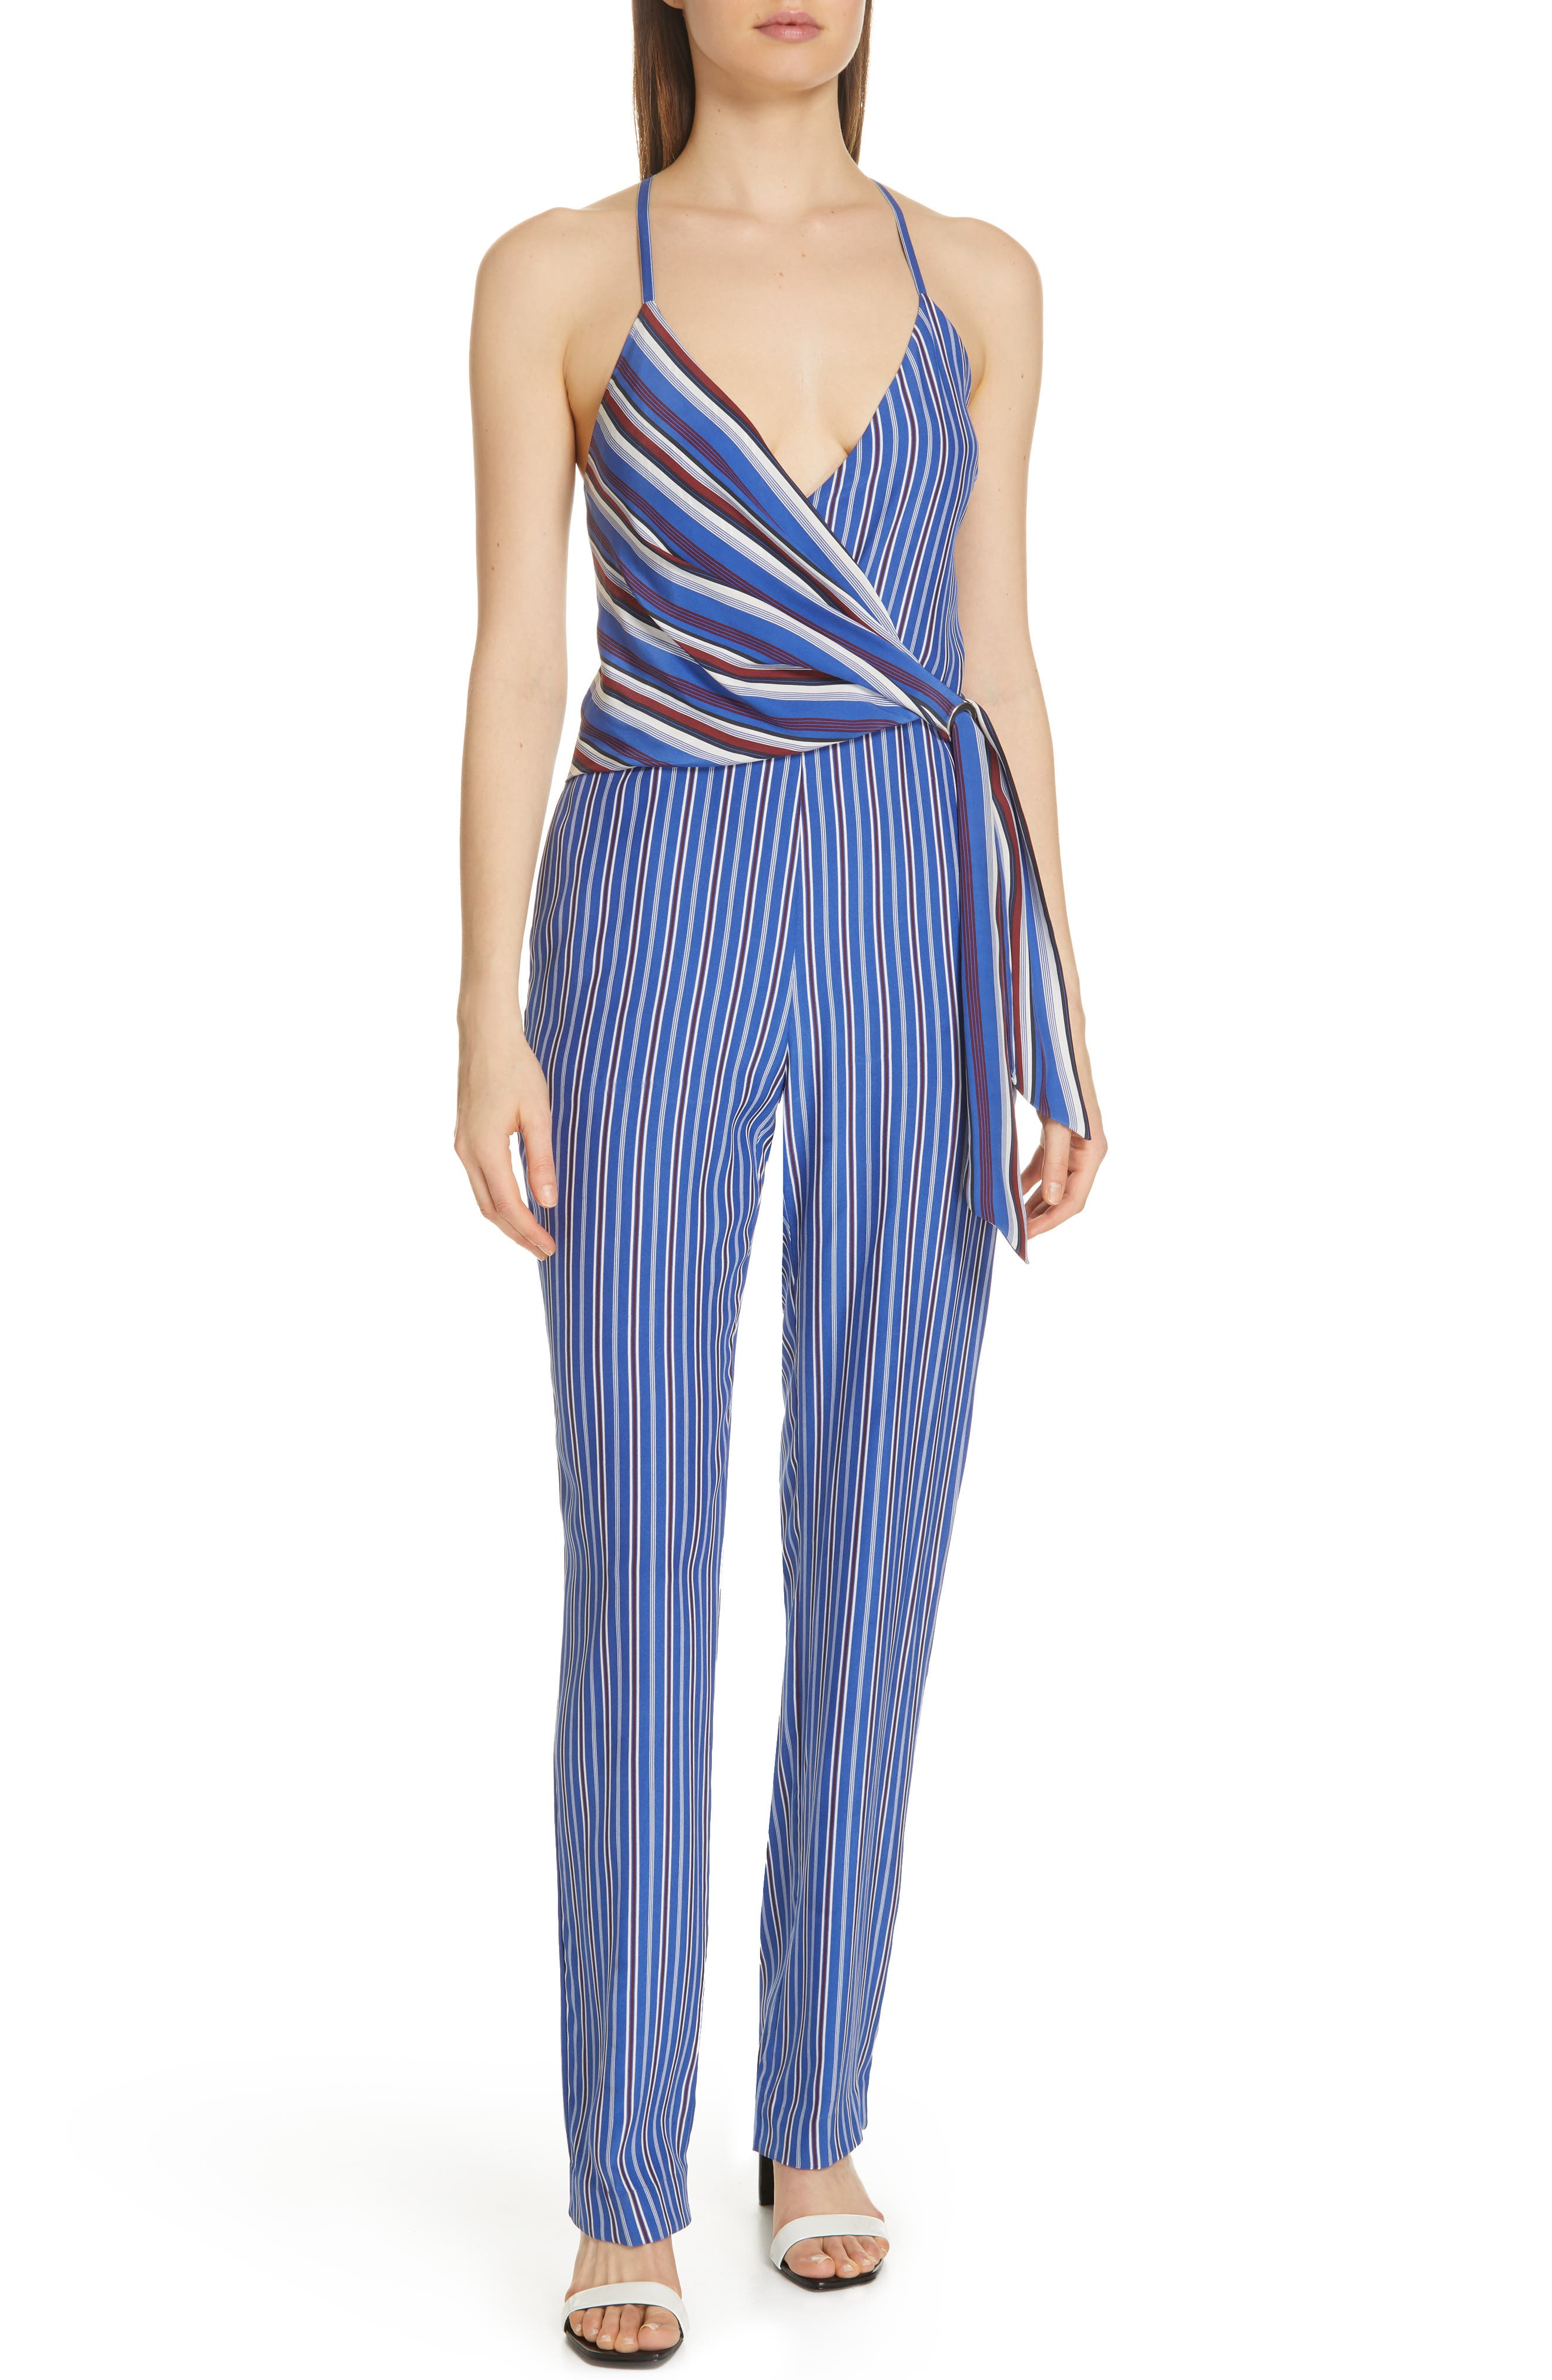 RAG & BONE, Felix Stripe Silk Jumpsuit, Main thumbnail 1, color, 474